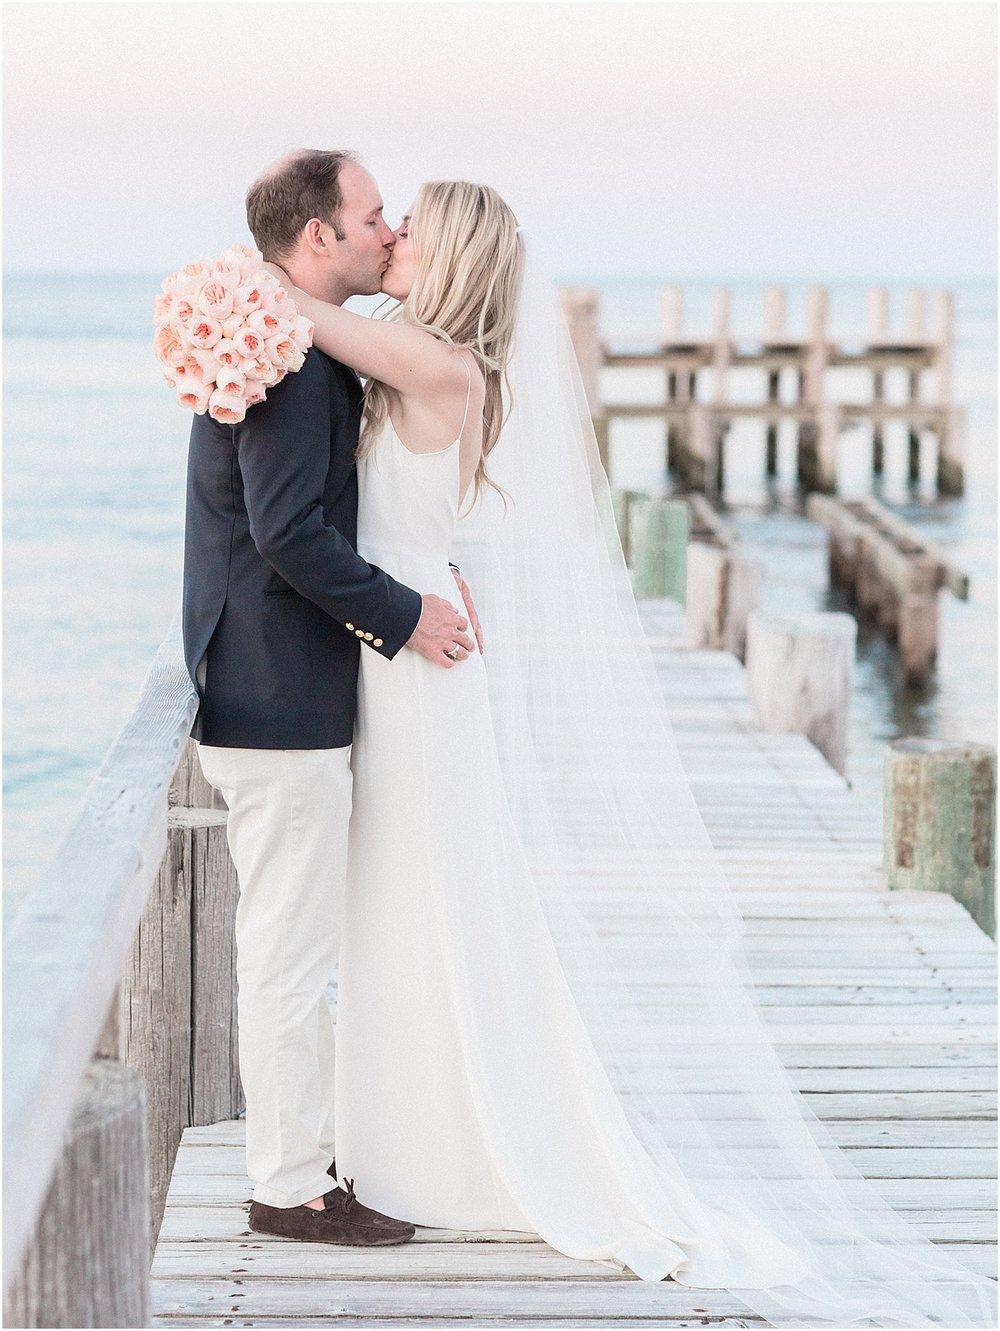 holly_sj_stephen_east_chop_beach_club_marthas_martha_s_vineyard_cape_cod_boston_wedding_photographer_meredith_jane_photography_photo_0257.jpg